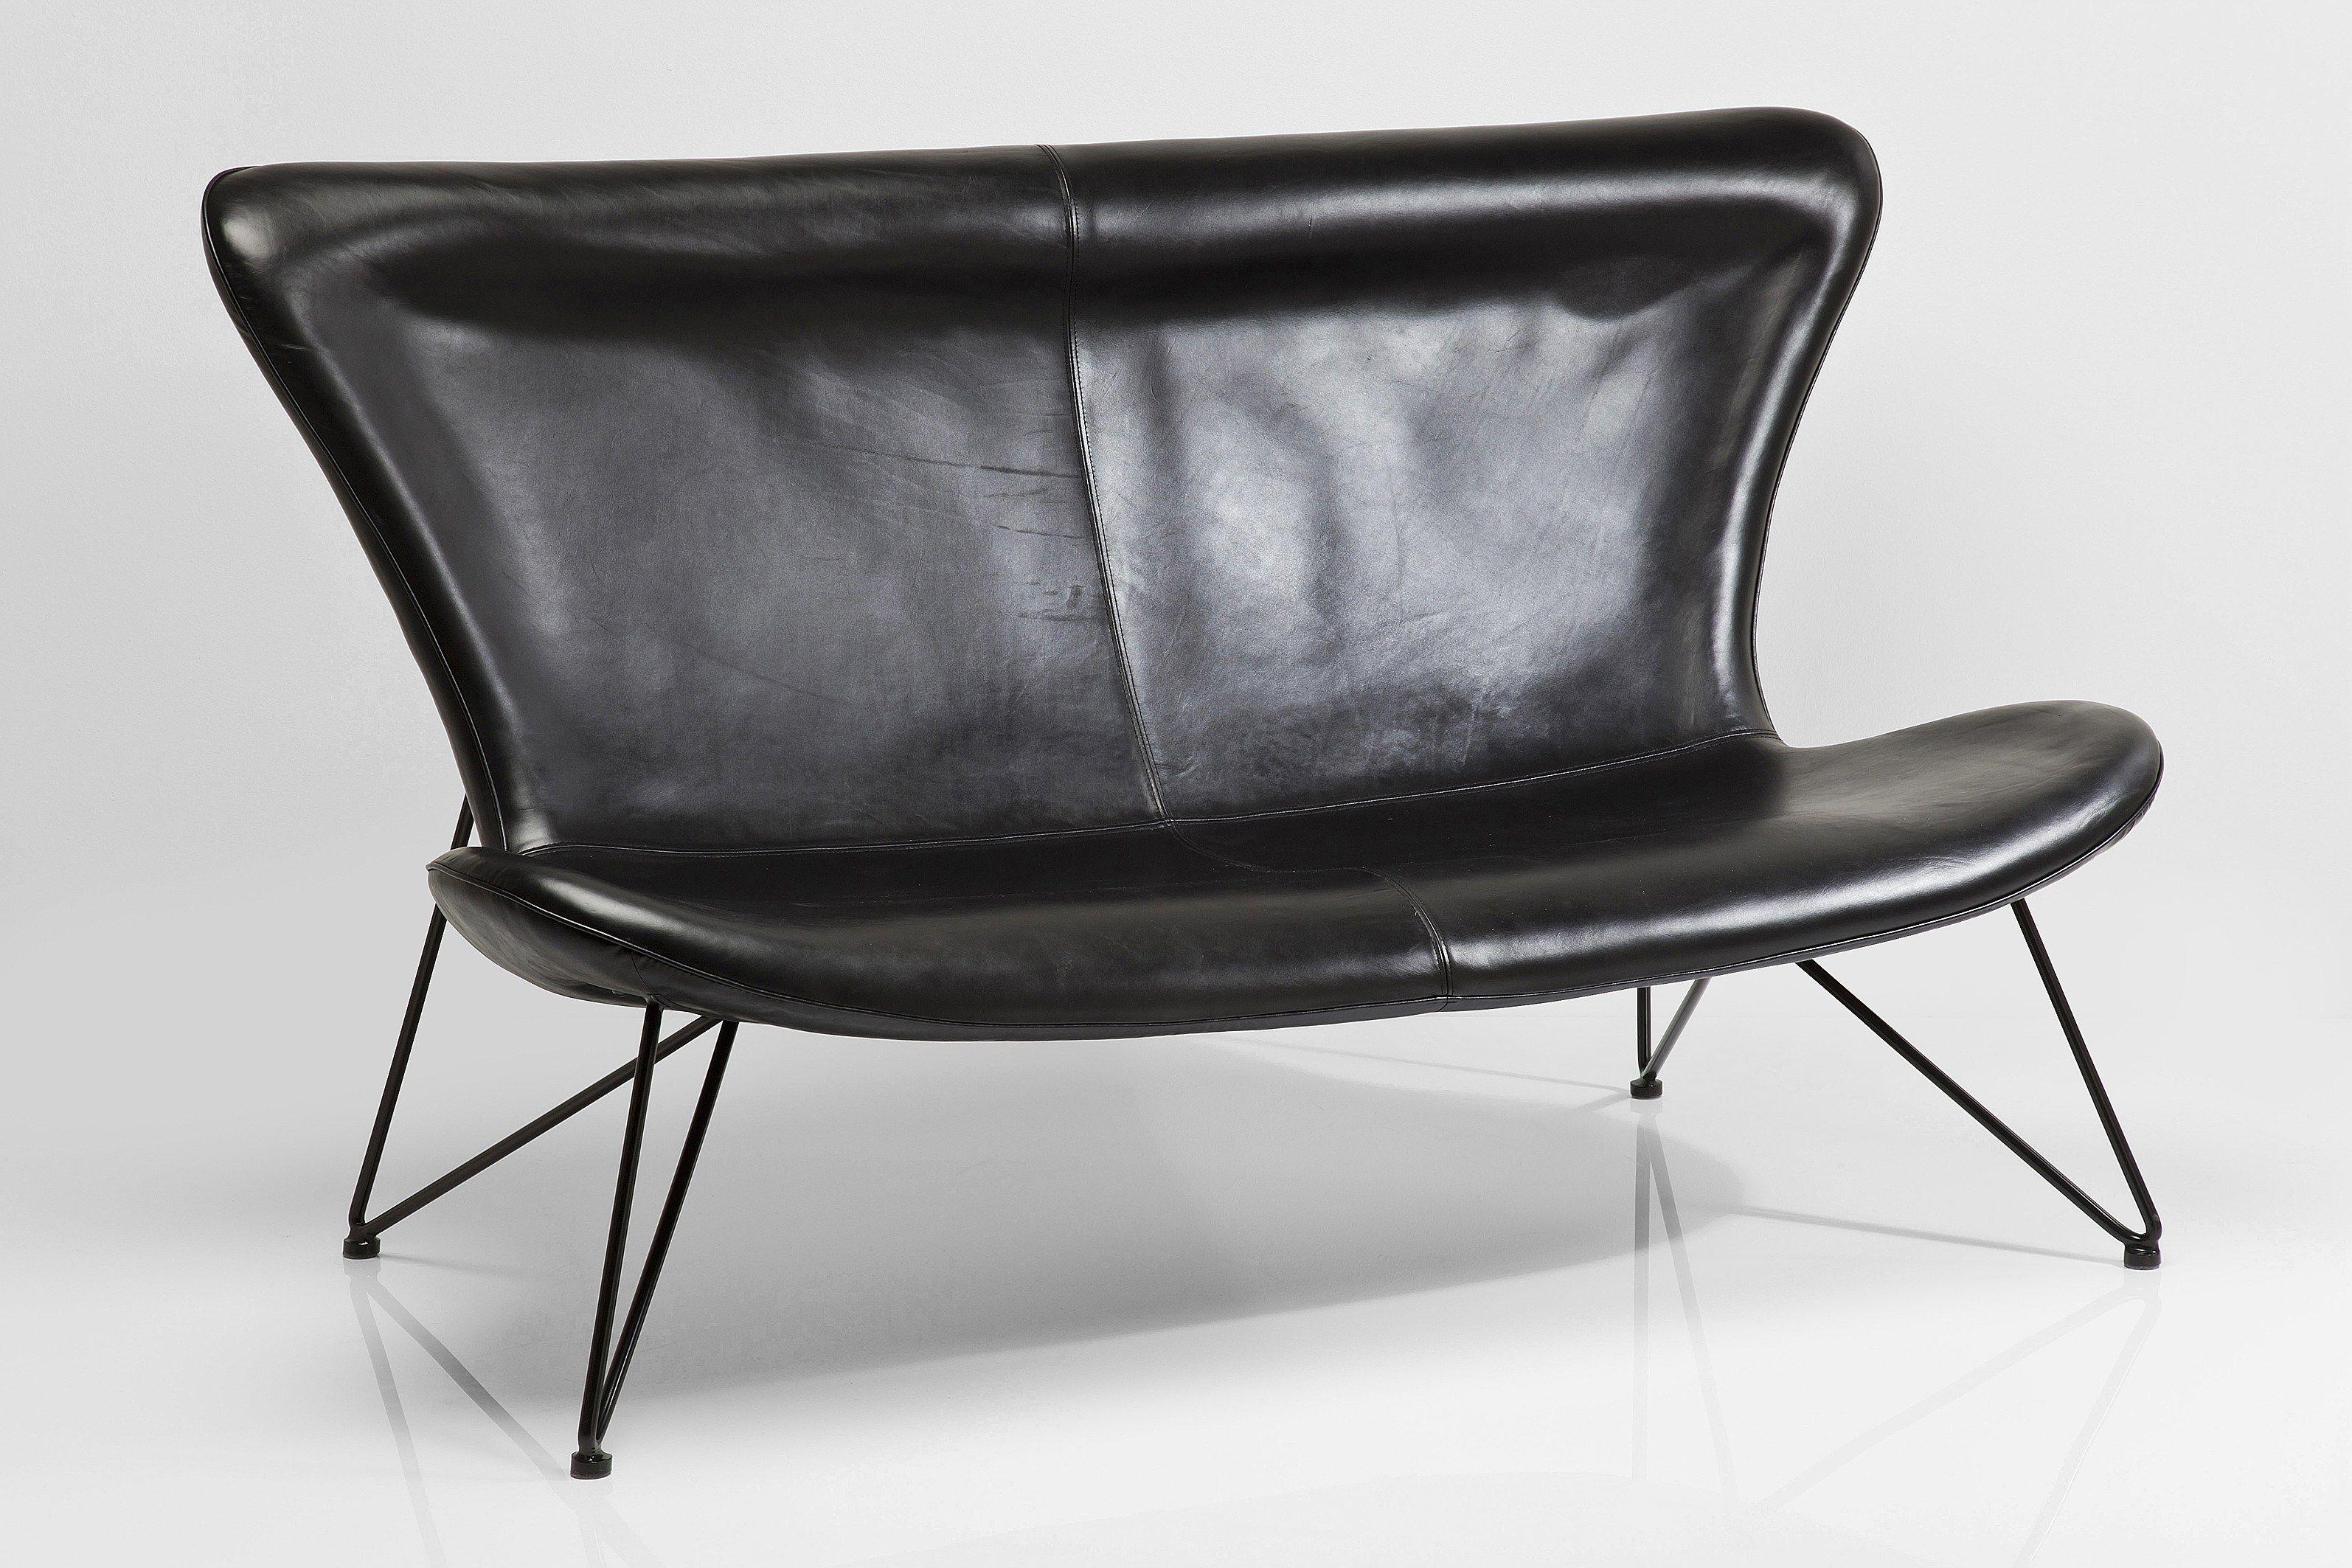 2 er sofa mit hoher r ckenlehne miami black by kare design. Black Bedroom Furniture Sets. Home Design Ideas